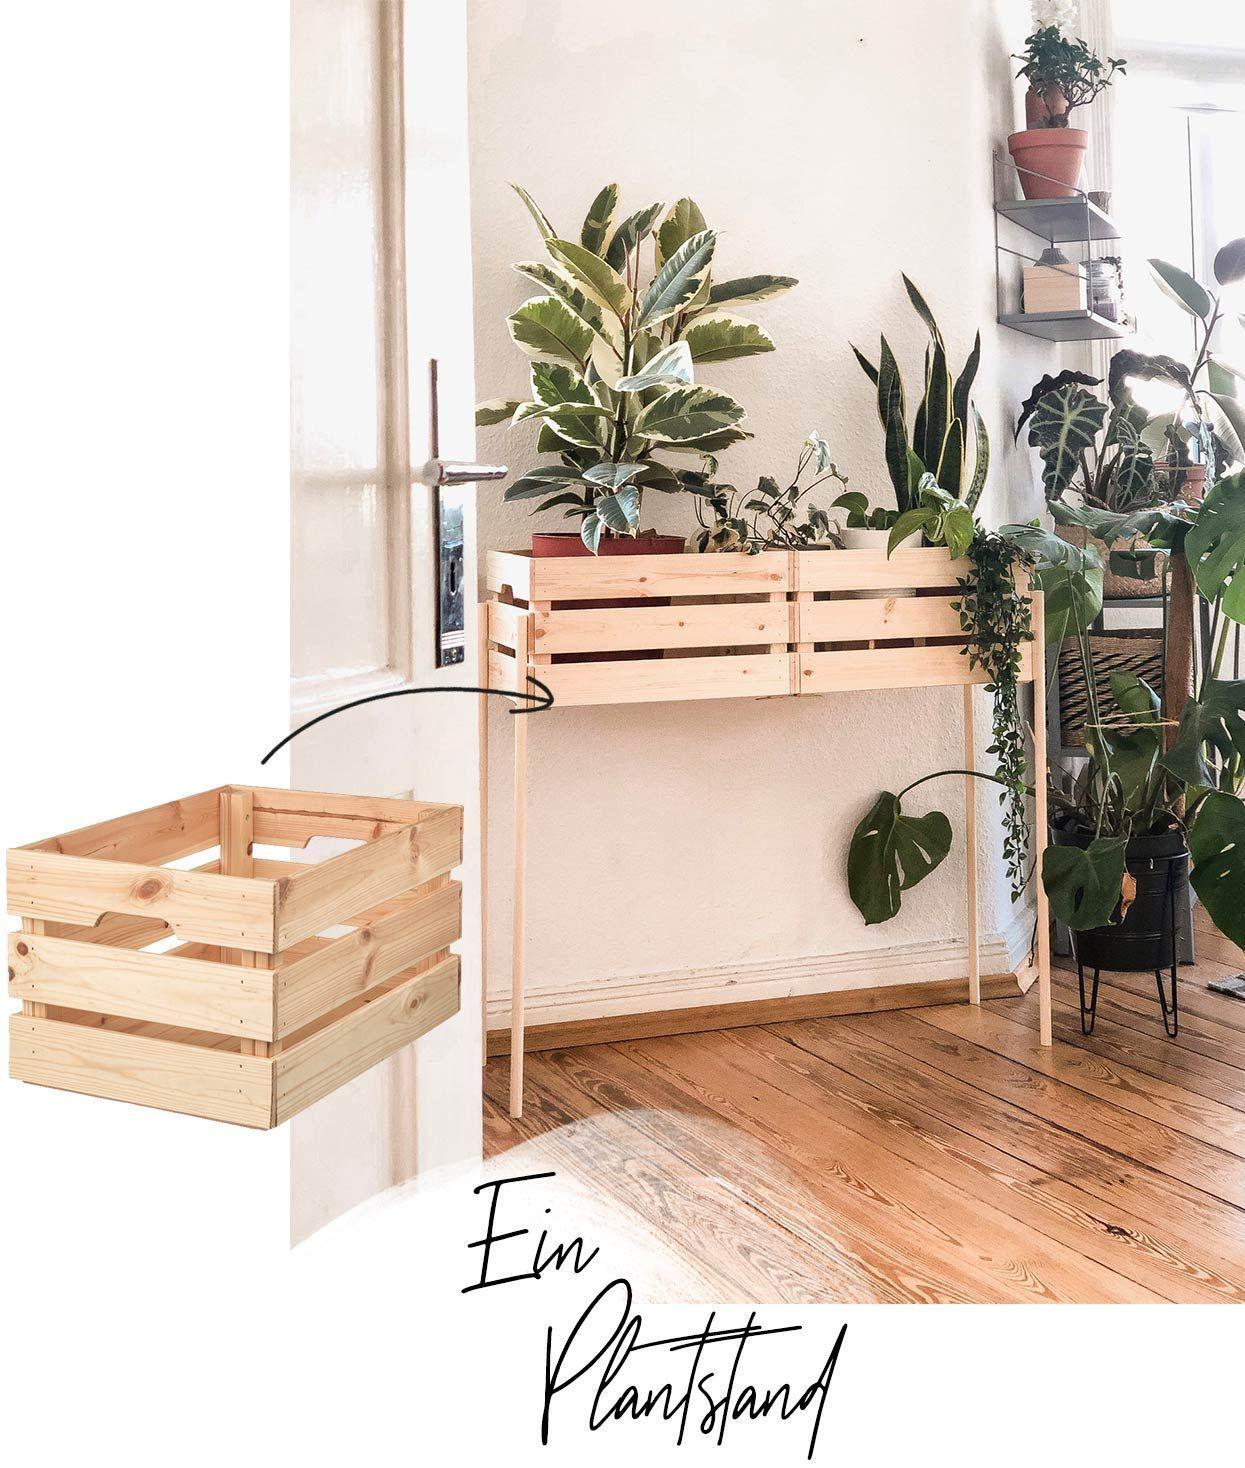 Boxen Bauen Kleidung Kosten Fantastisch Ikea In 2020 With Images Ikea Boxes Plant Stand Ikea Diy